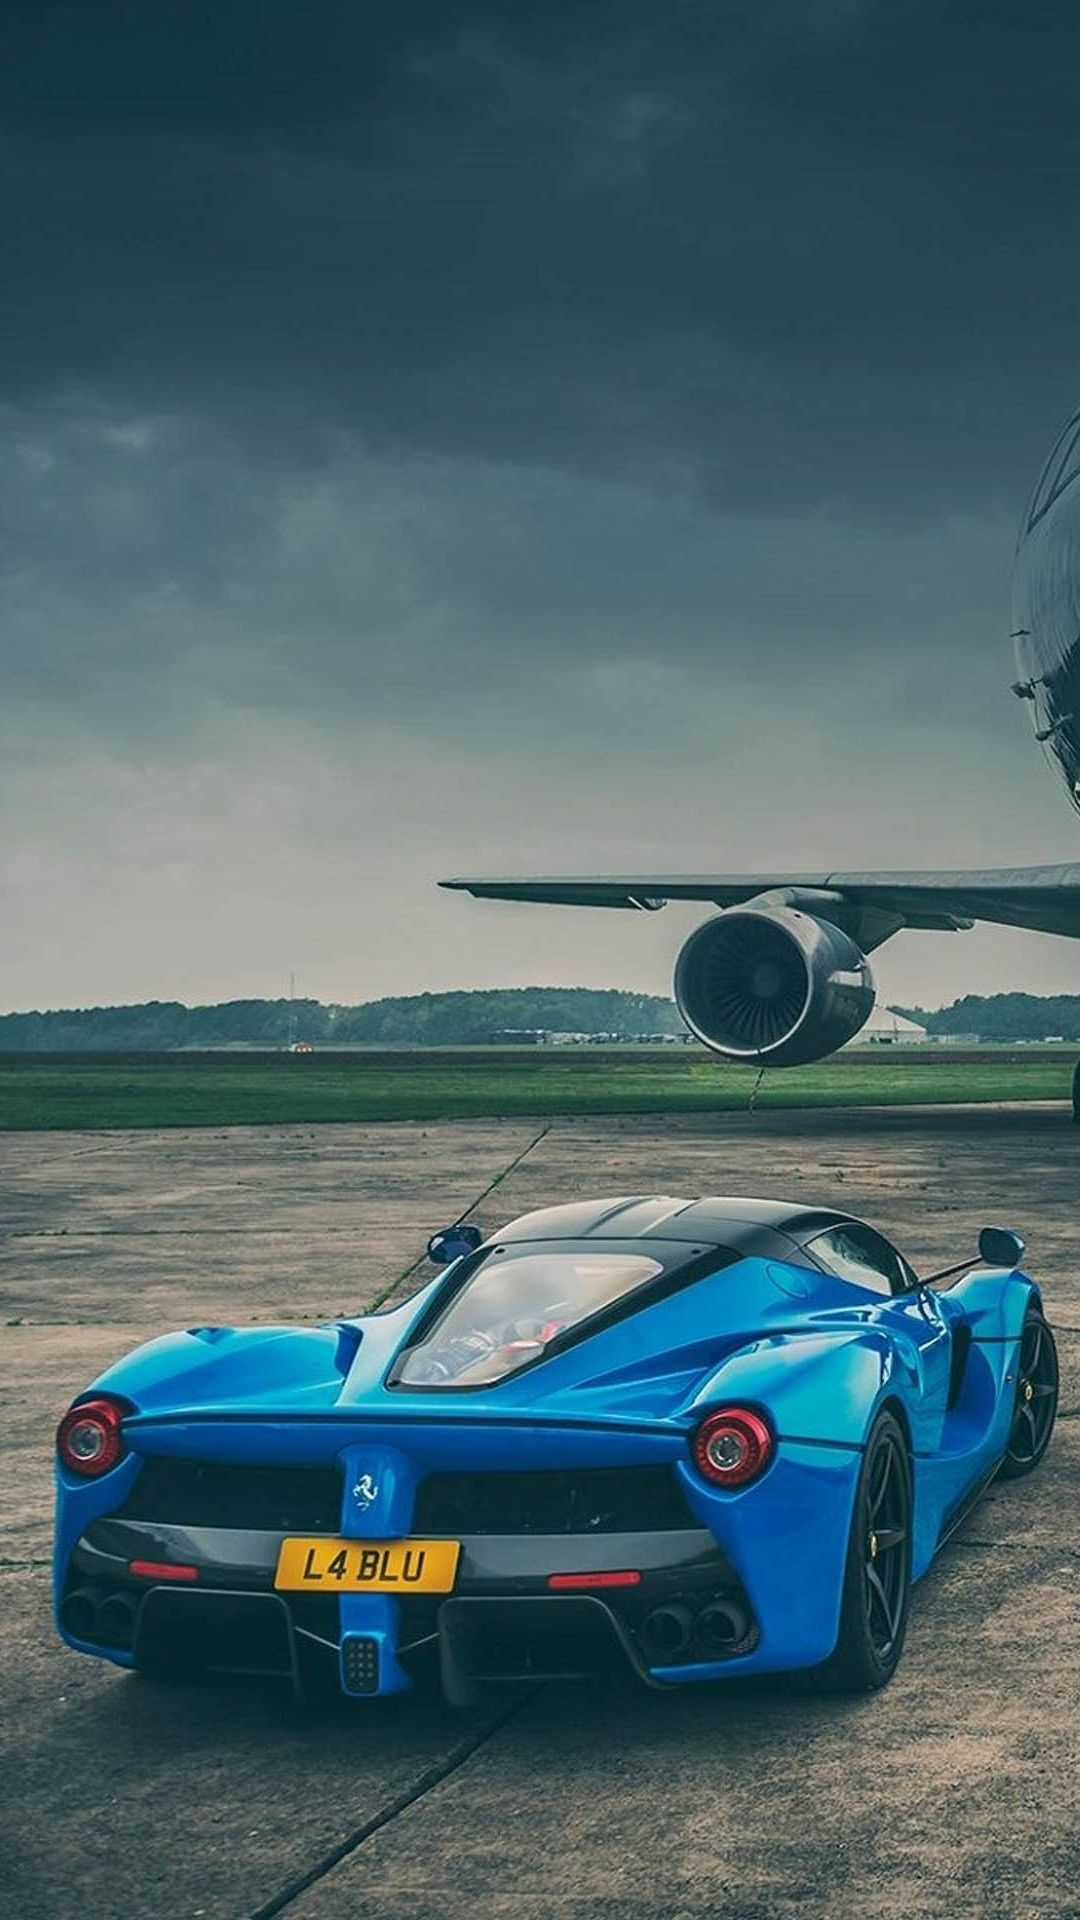 Ferrari iPhone Wallpapers | Sports cars luxury, Car wallpapers, Ferrari laferrari